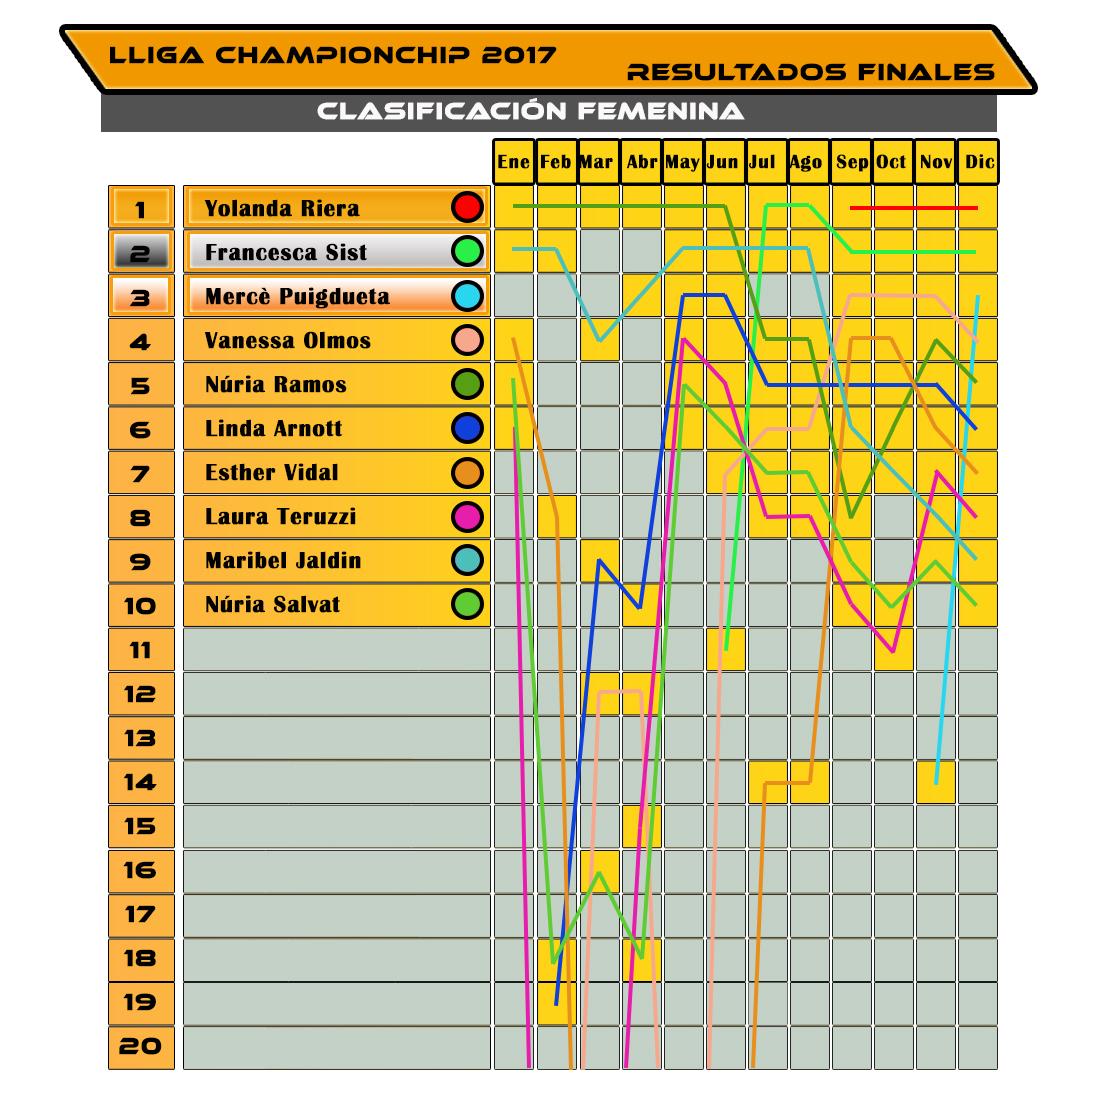 Evolución Clasificación Femenina - Lliga Championchip 2017